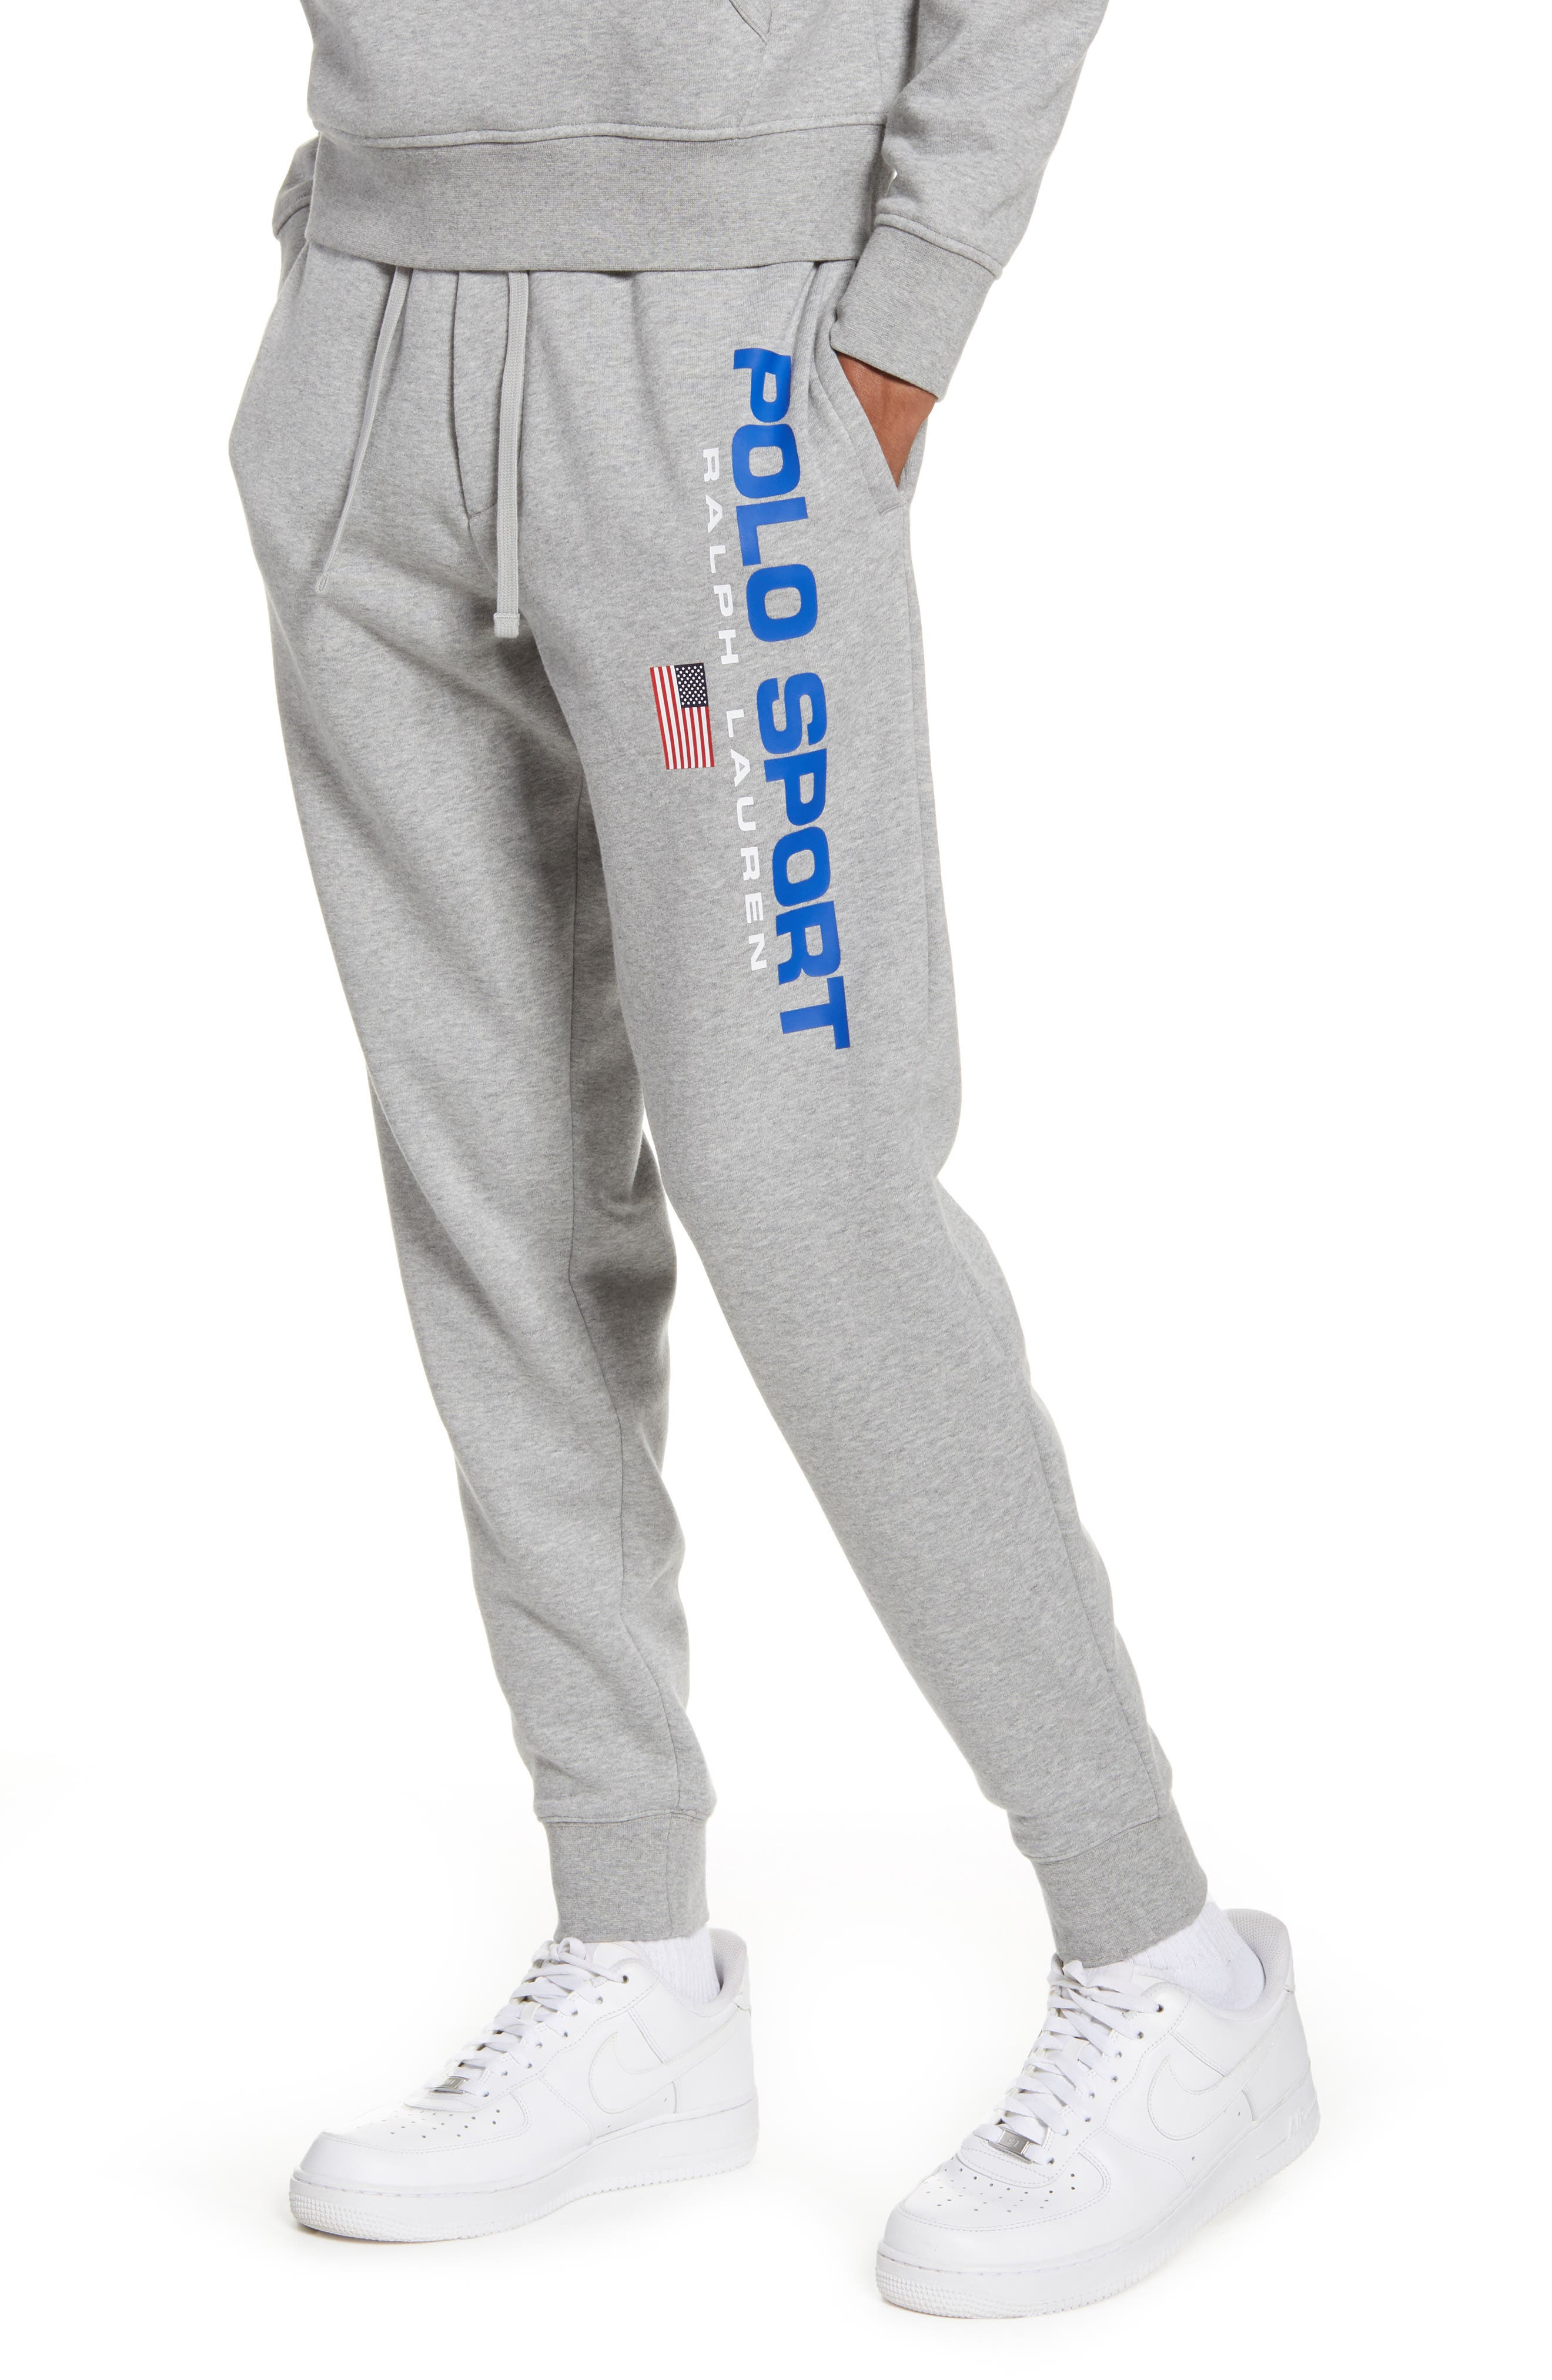 Boys Polo Sport Ralph Lauren Athletic Sweatpants